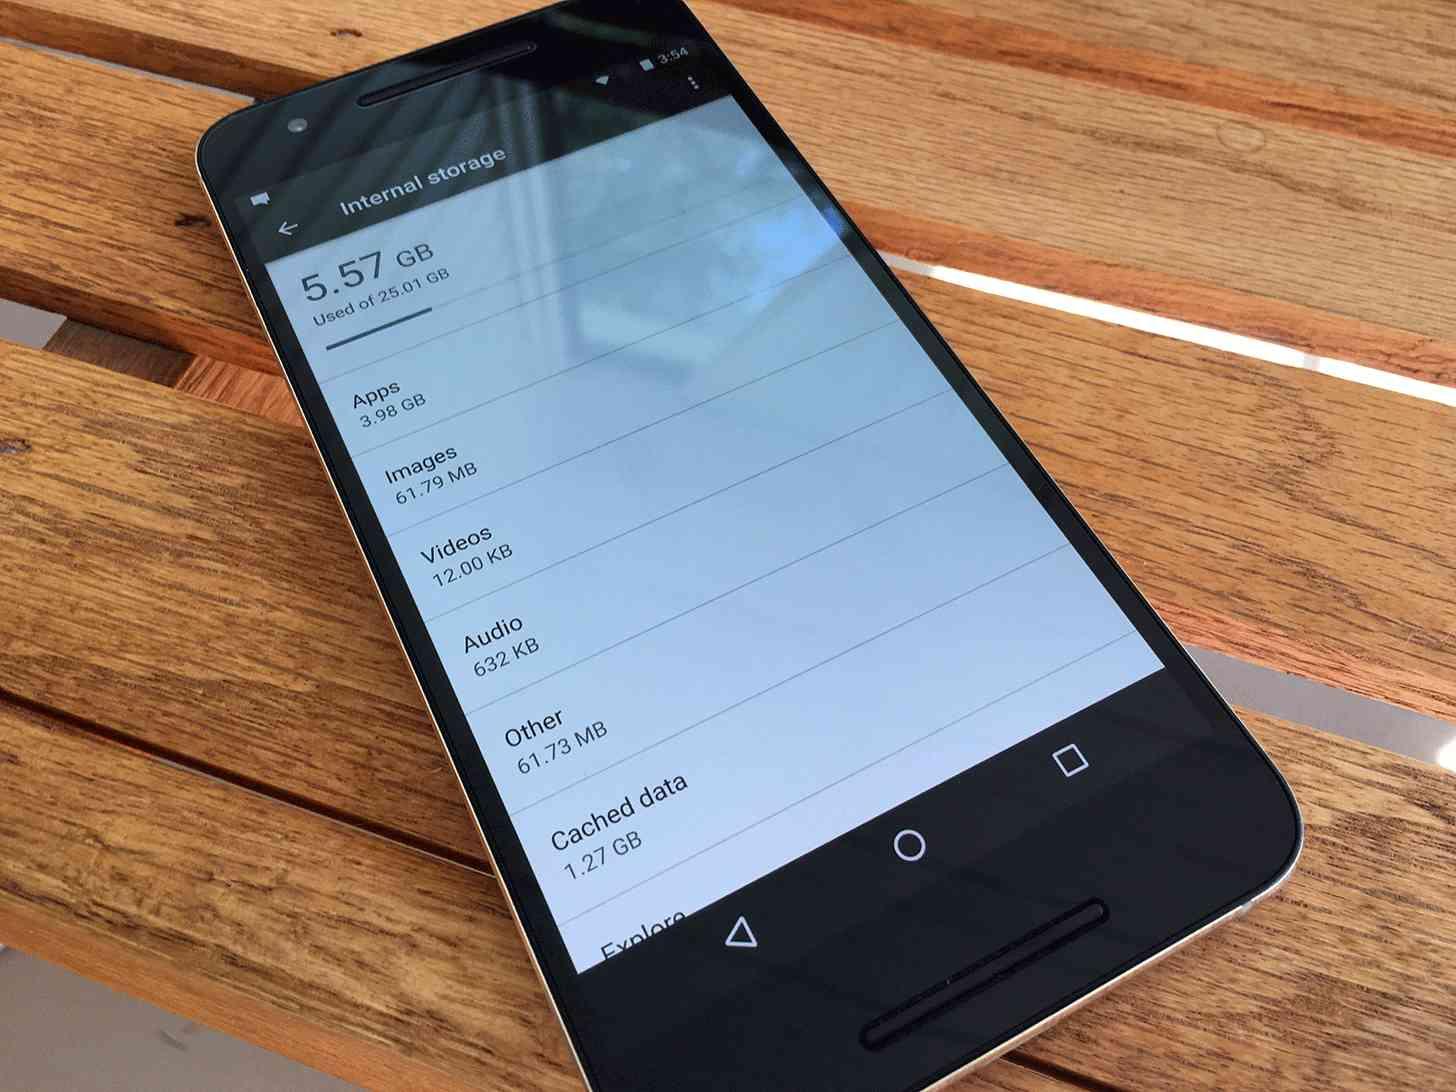 Nexus 6P storage Settings app